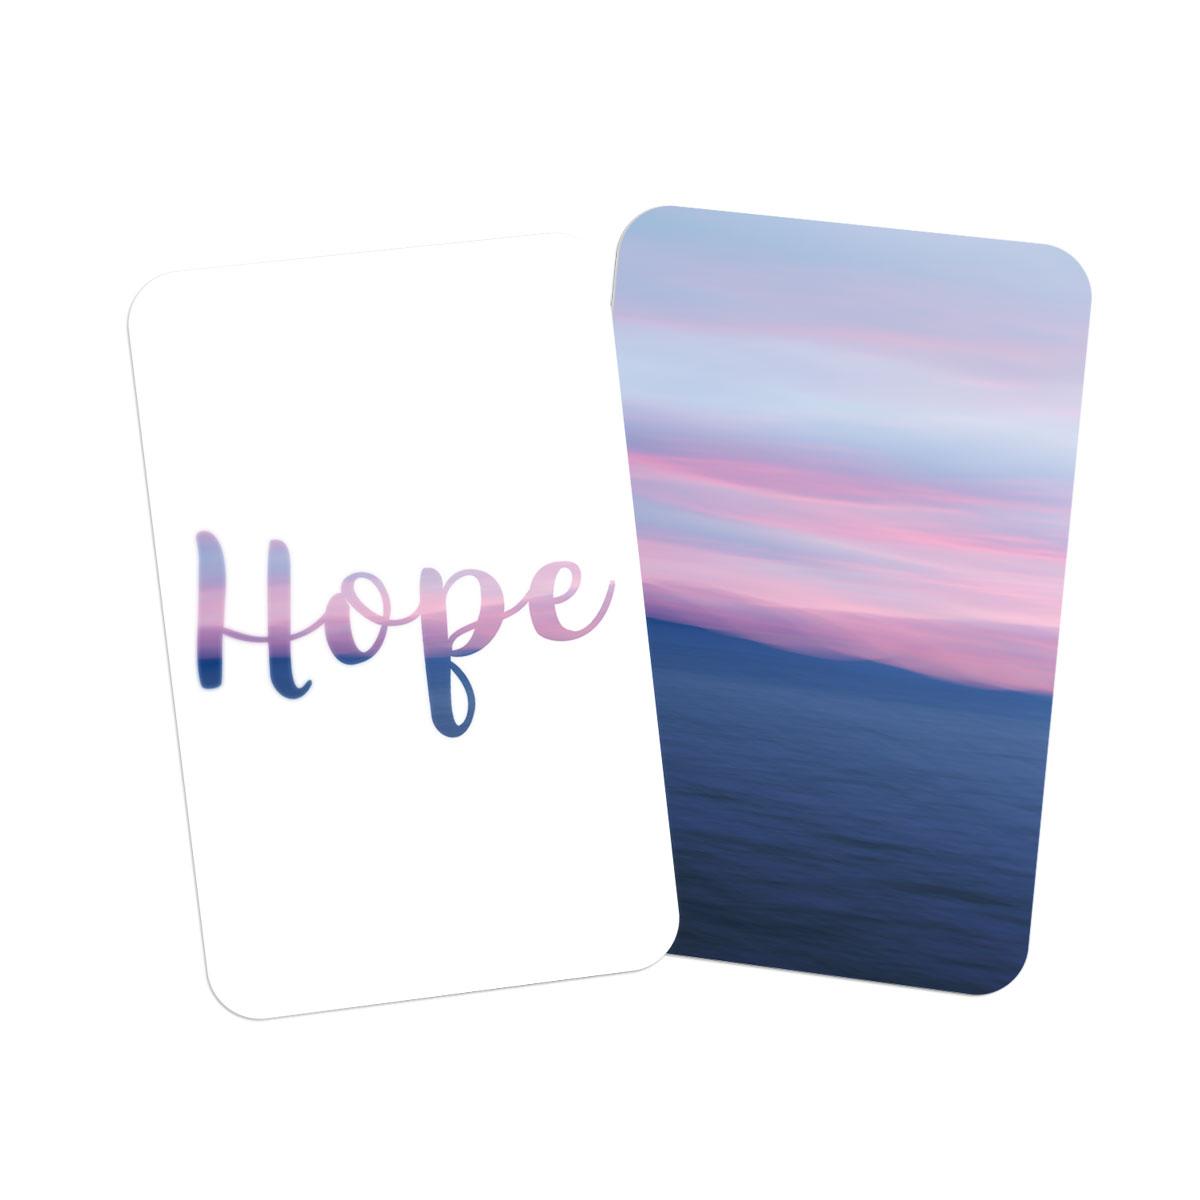 Hope_Pair_Square.jpg